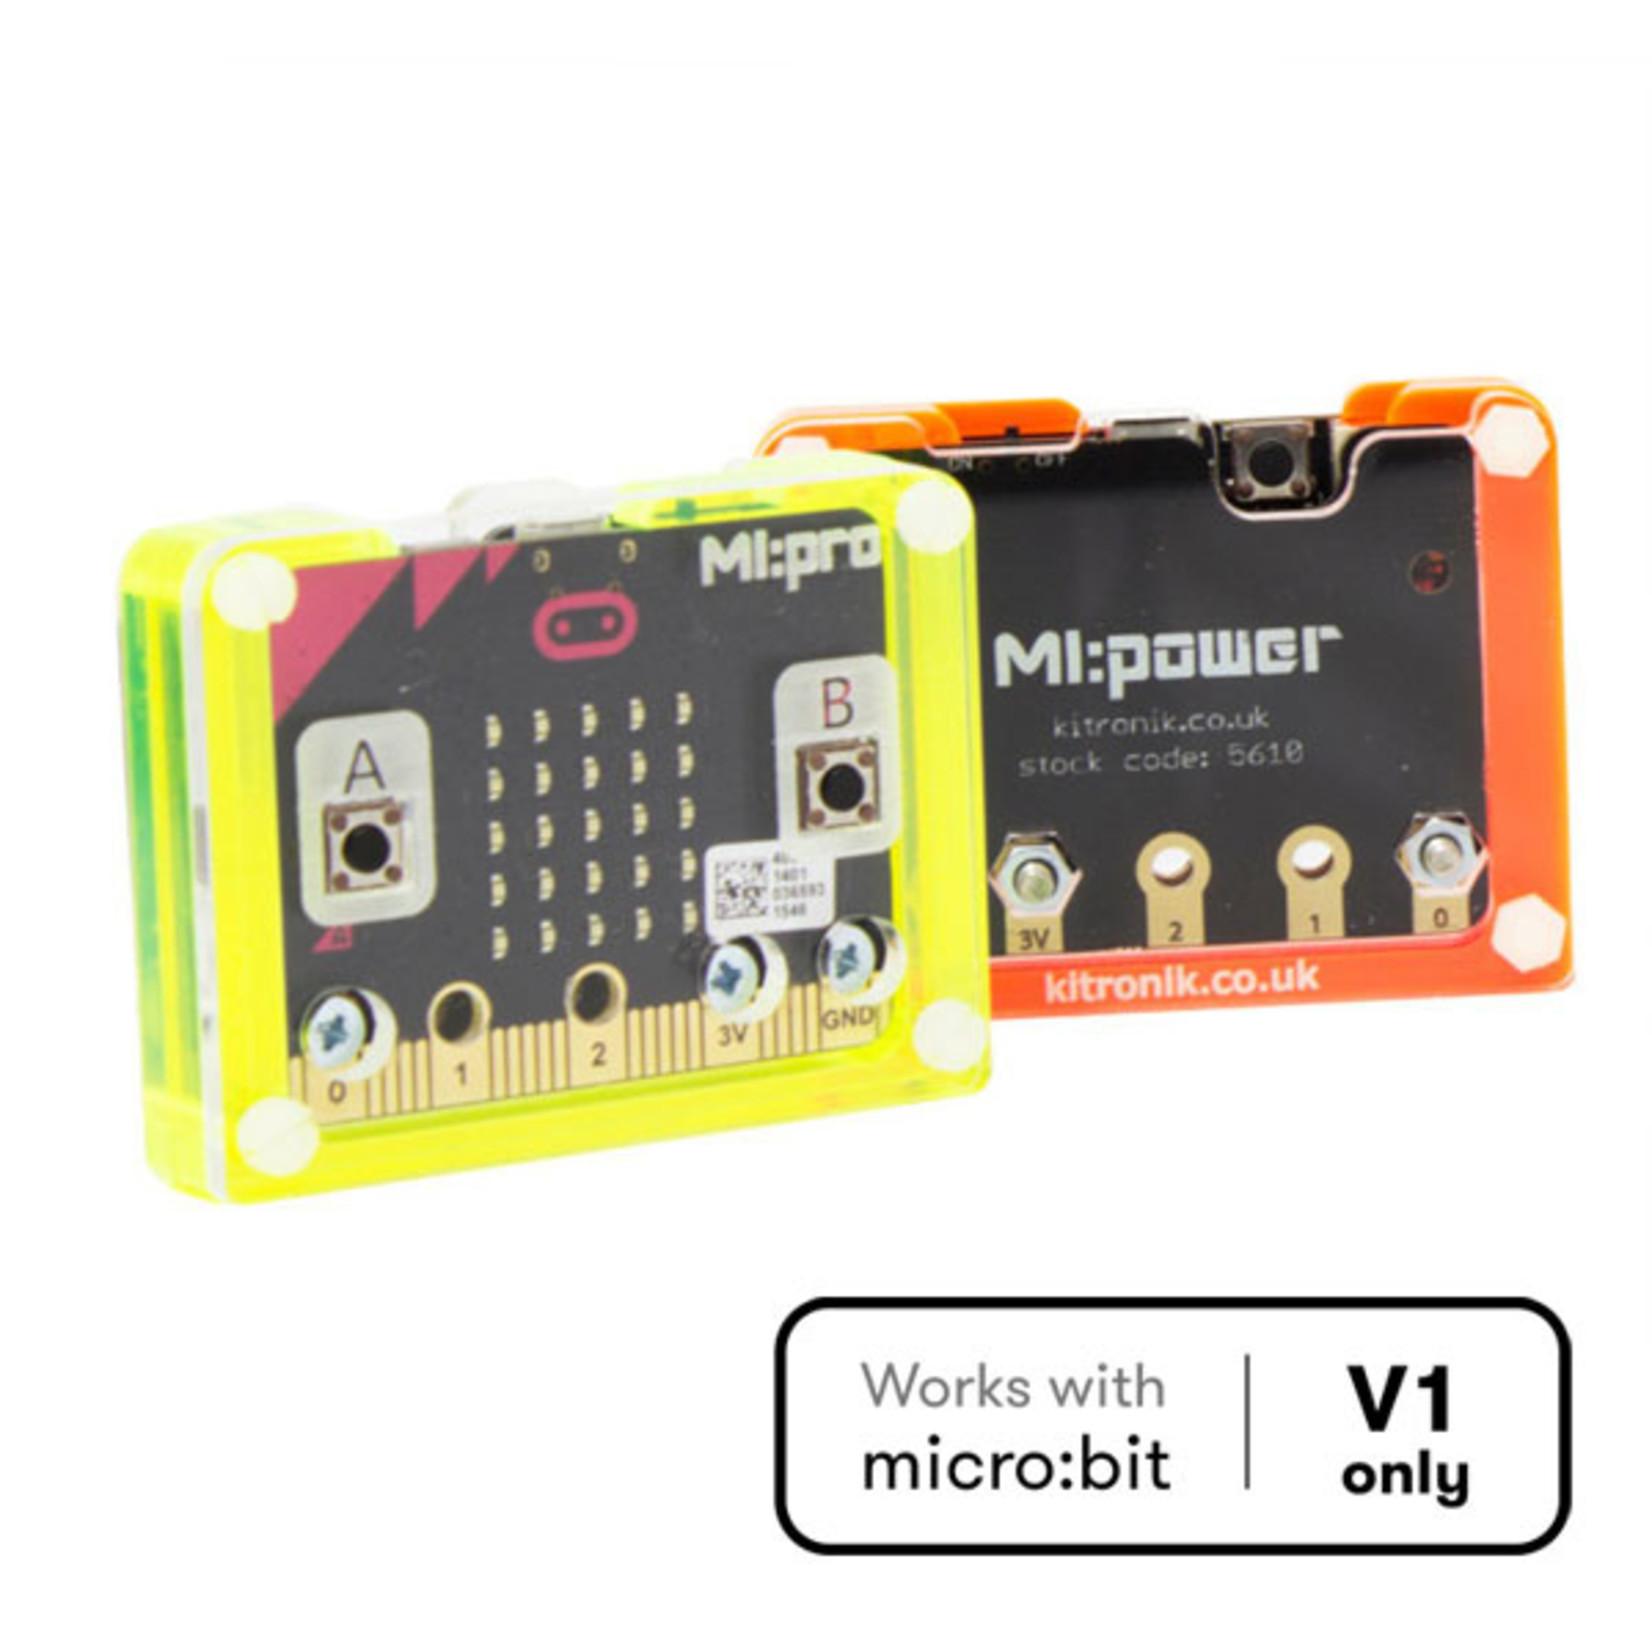 Kitronik MI:power Case for the BBC micro:bit - Green